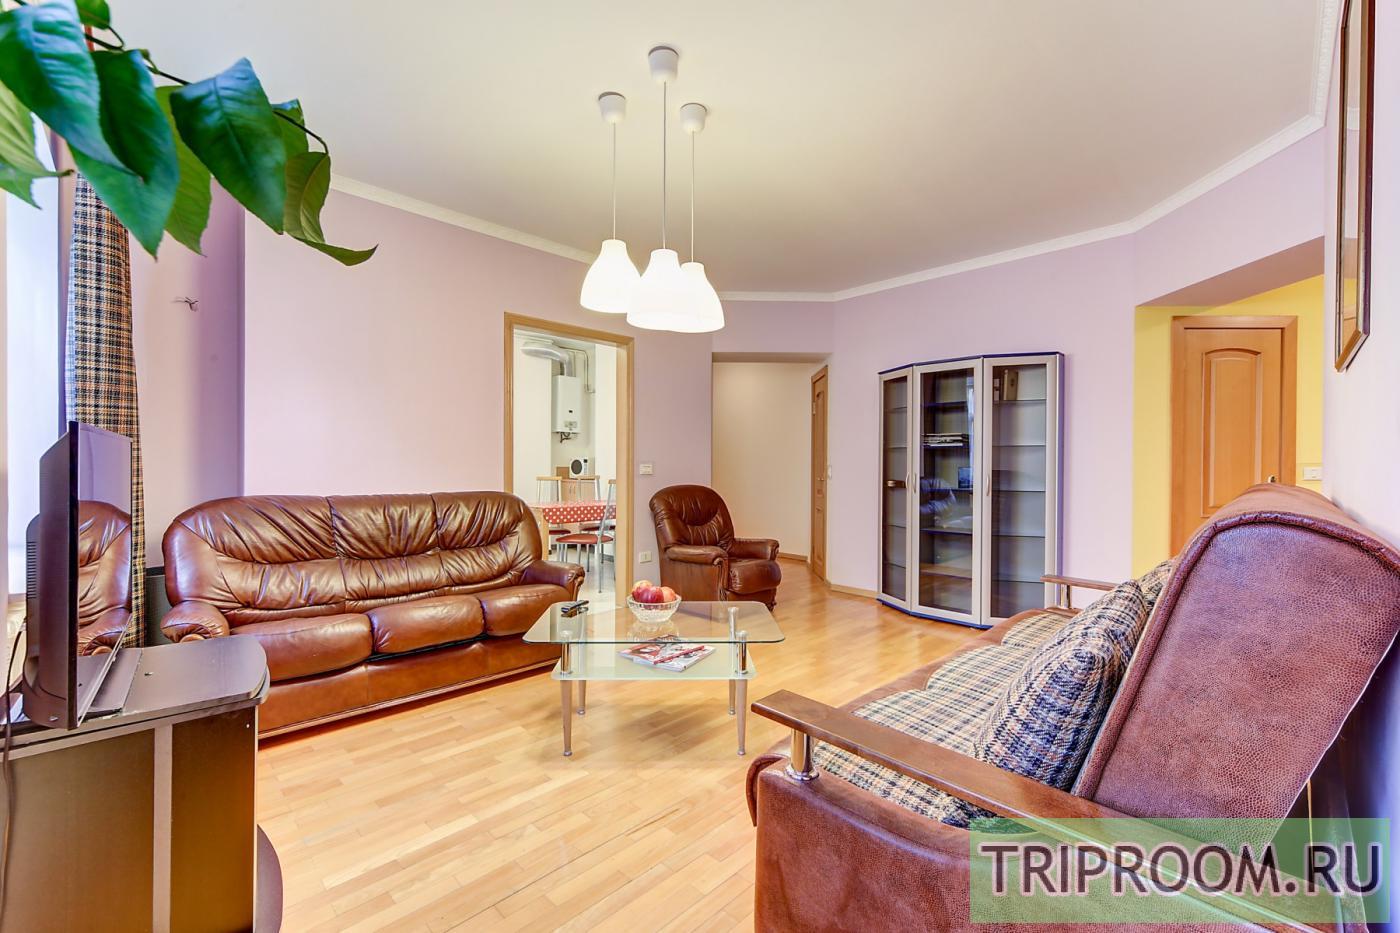 2-комнатная квартира посуточно (вариант № 20143), ул. Невский проспект, фото № 5